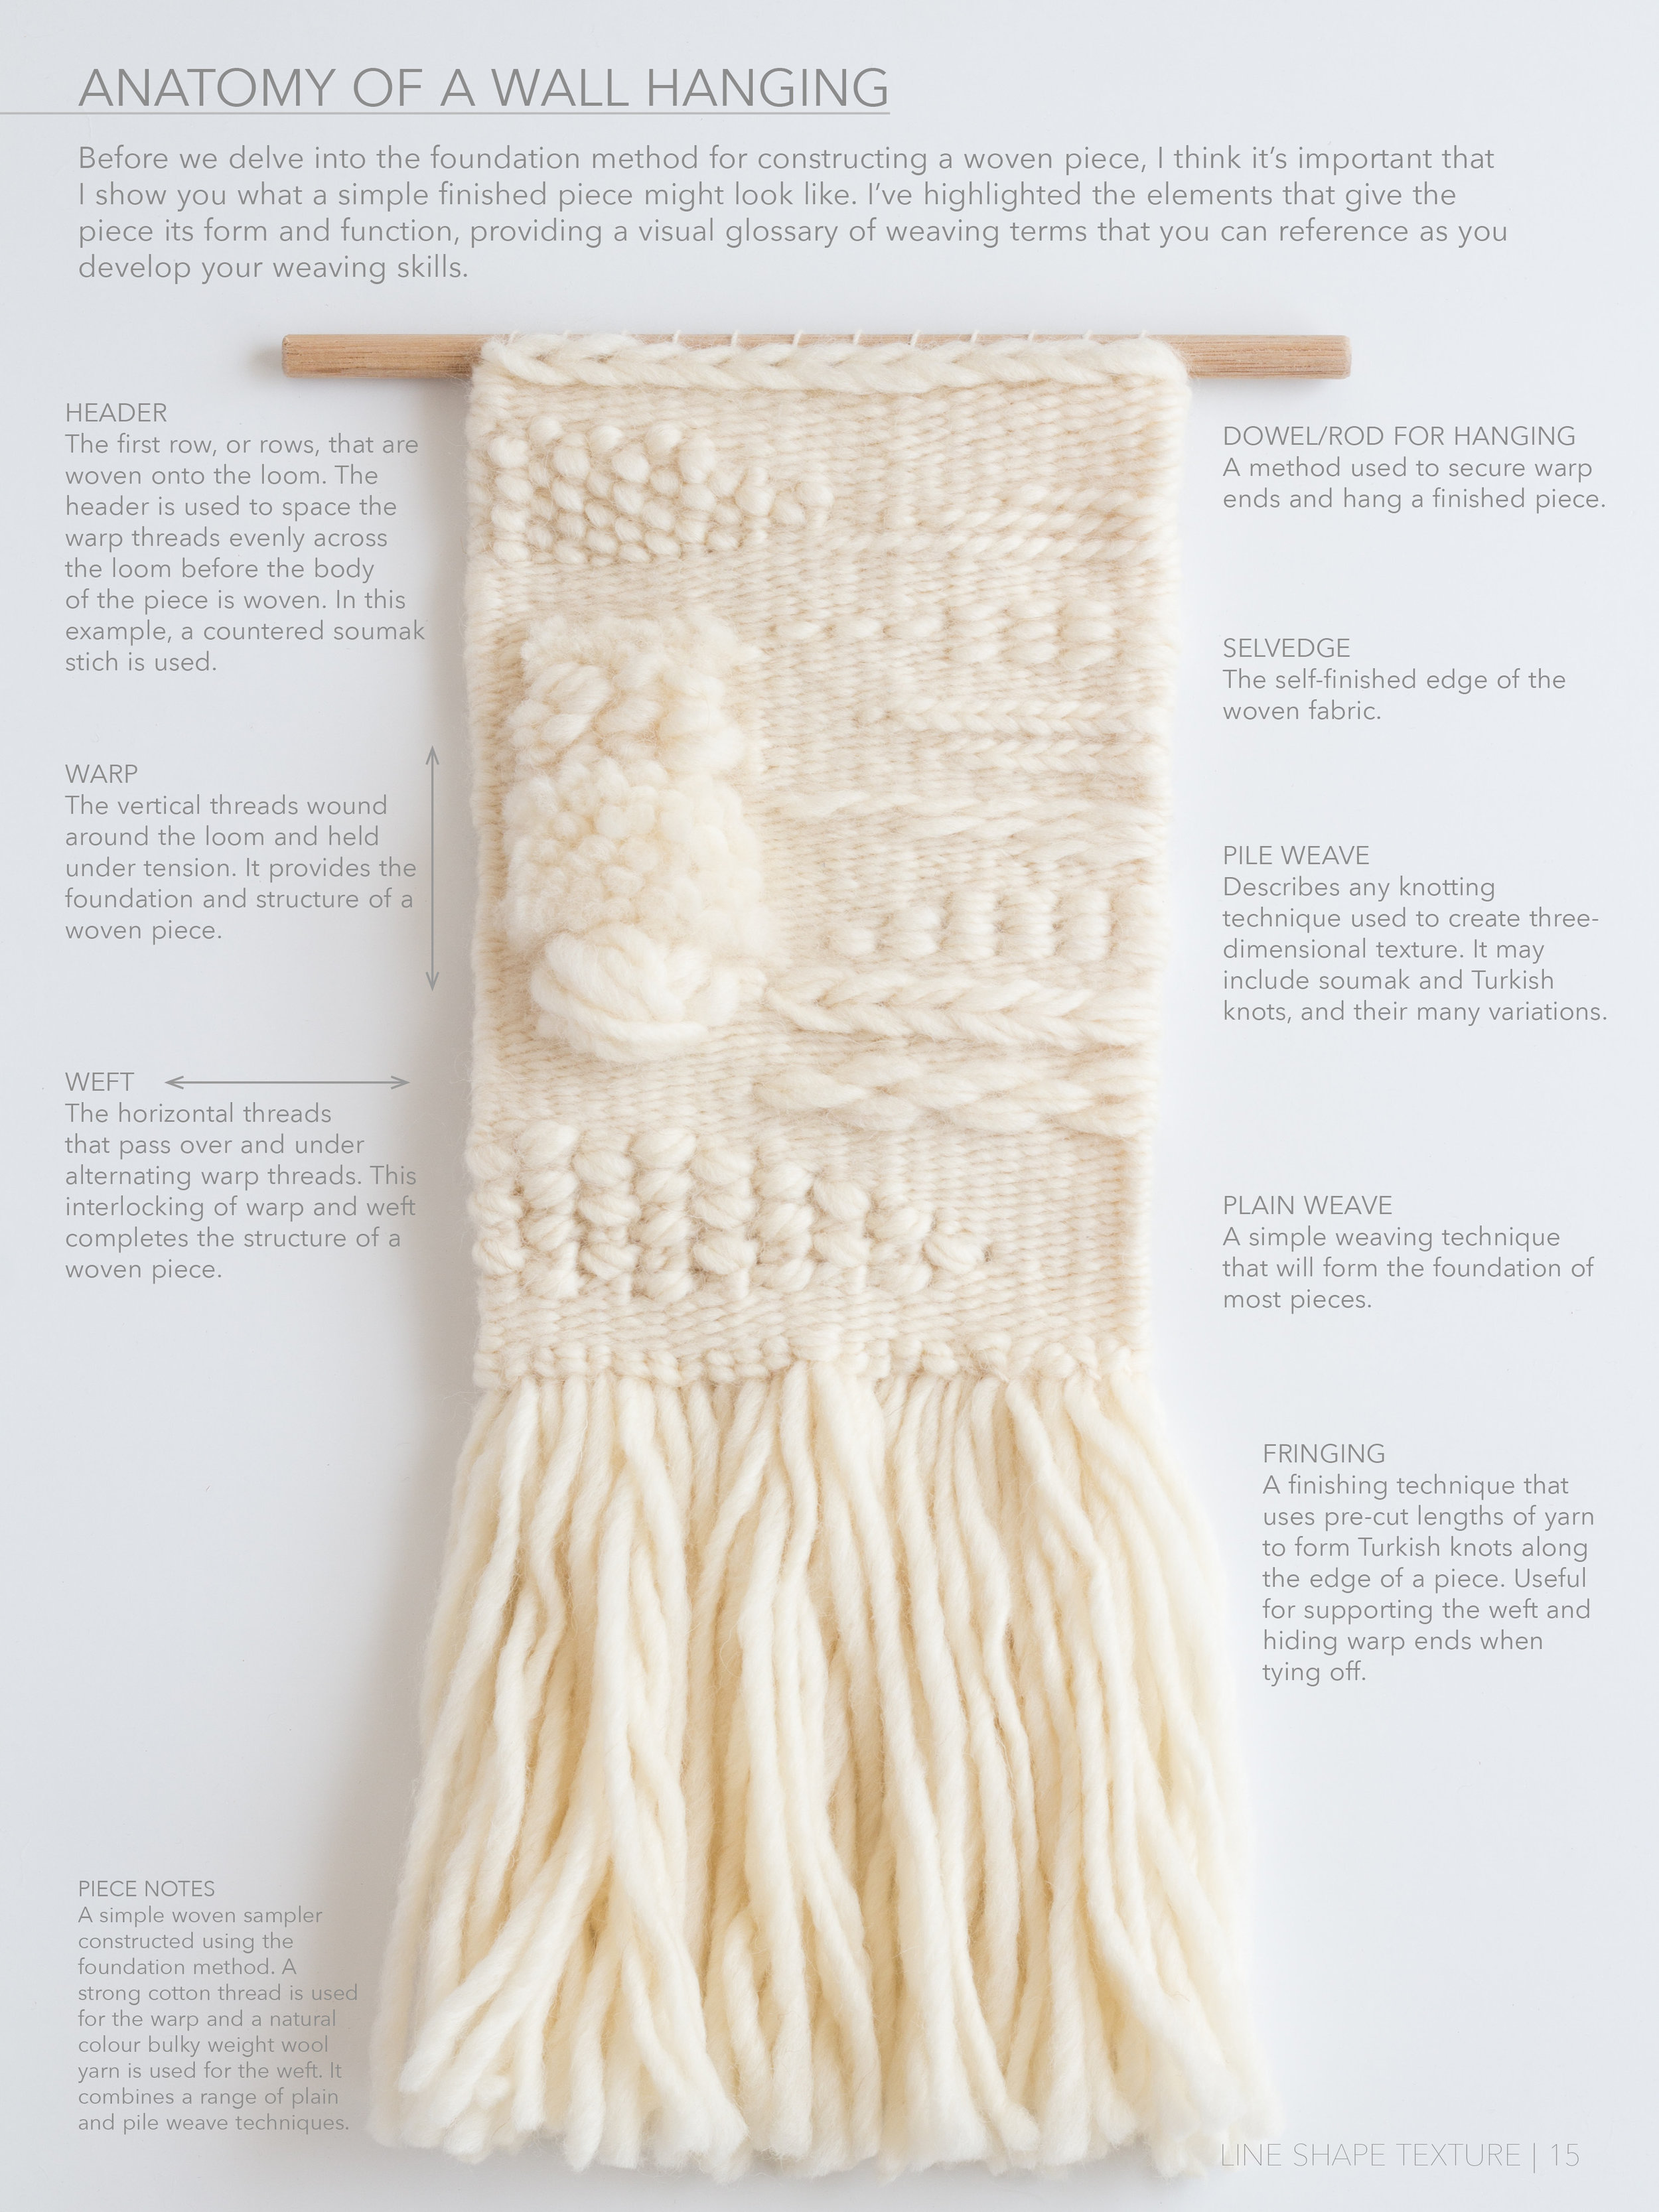 LINE SHAPE TEXTURE A Creative's Guide to Frame-Loom Weaving 5.jpg